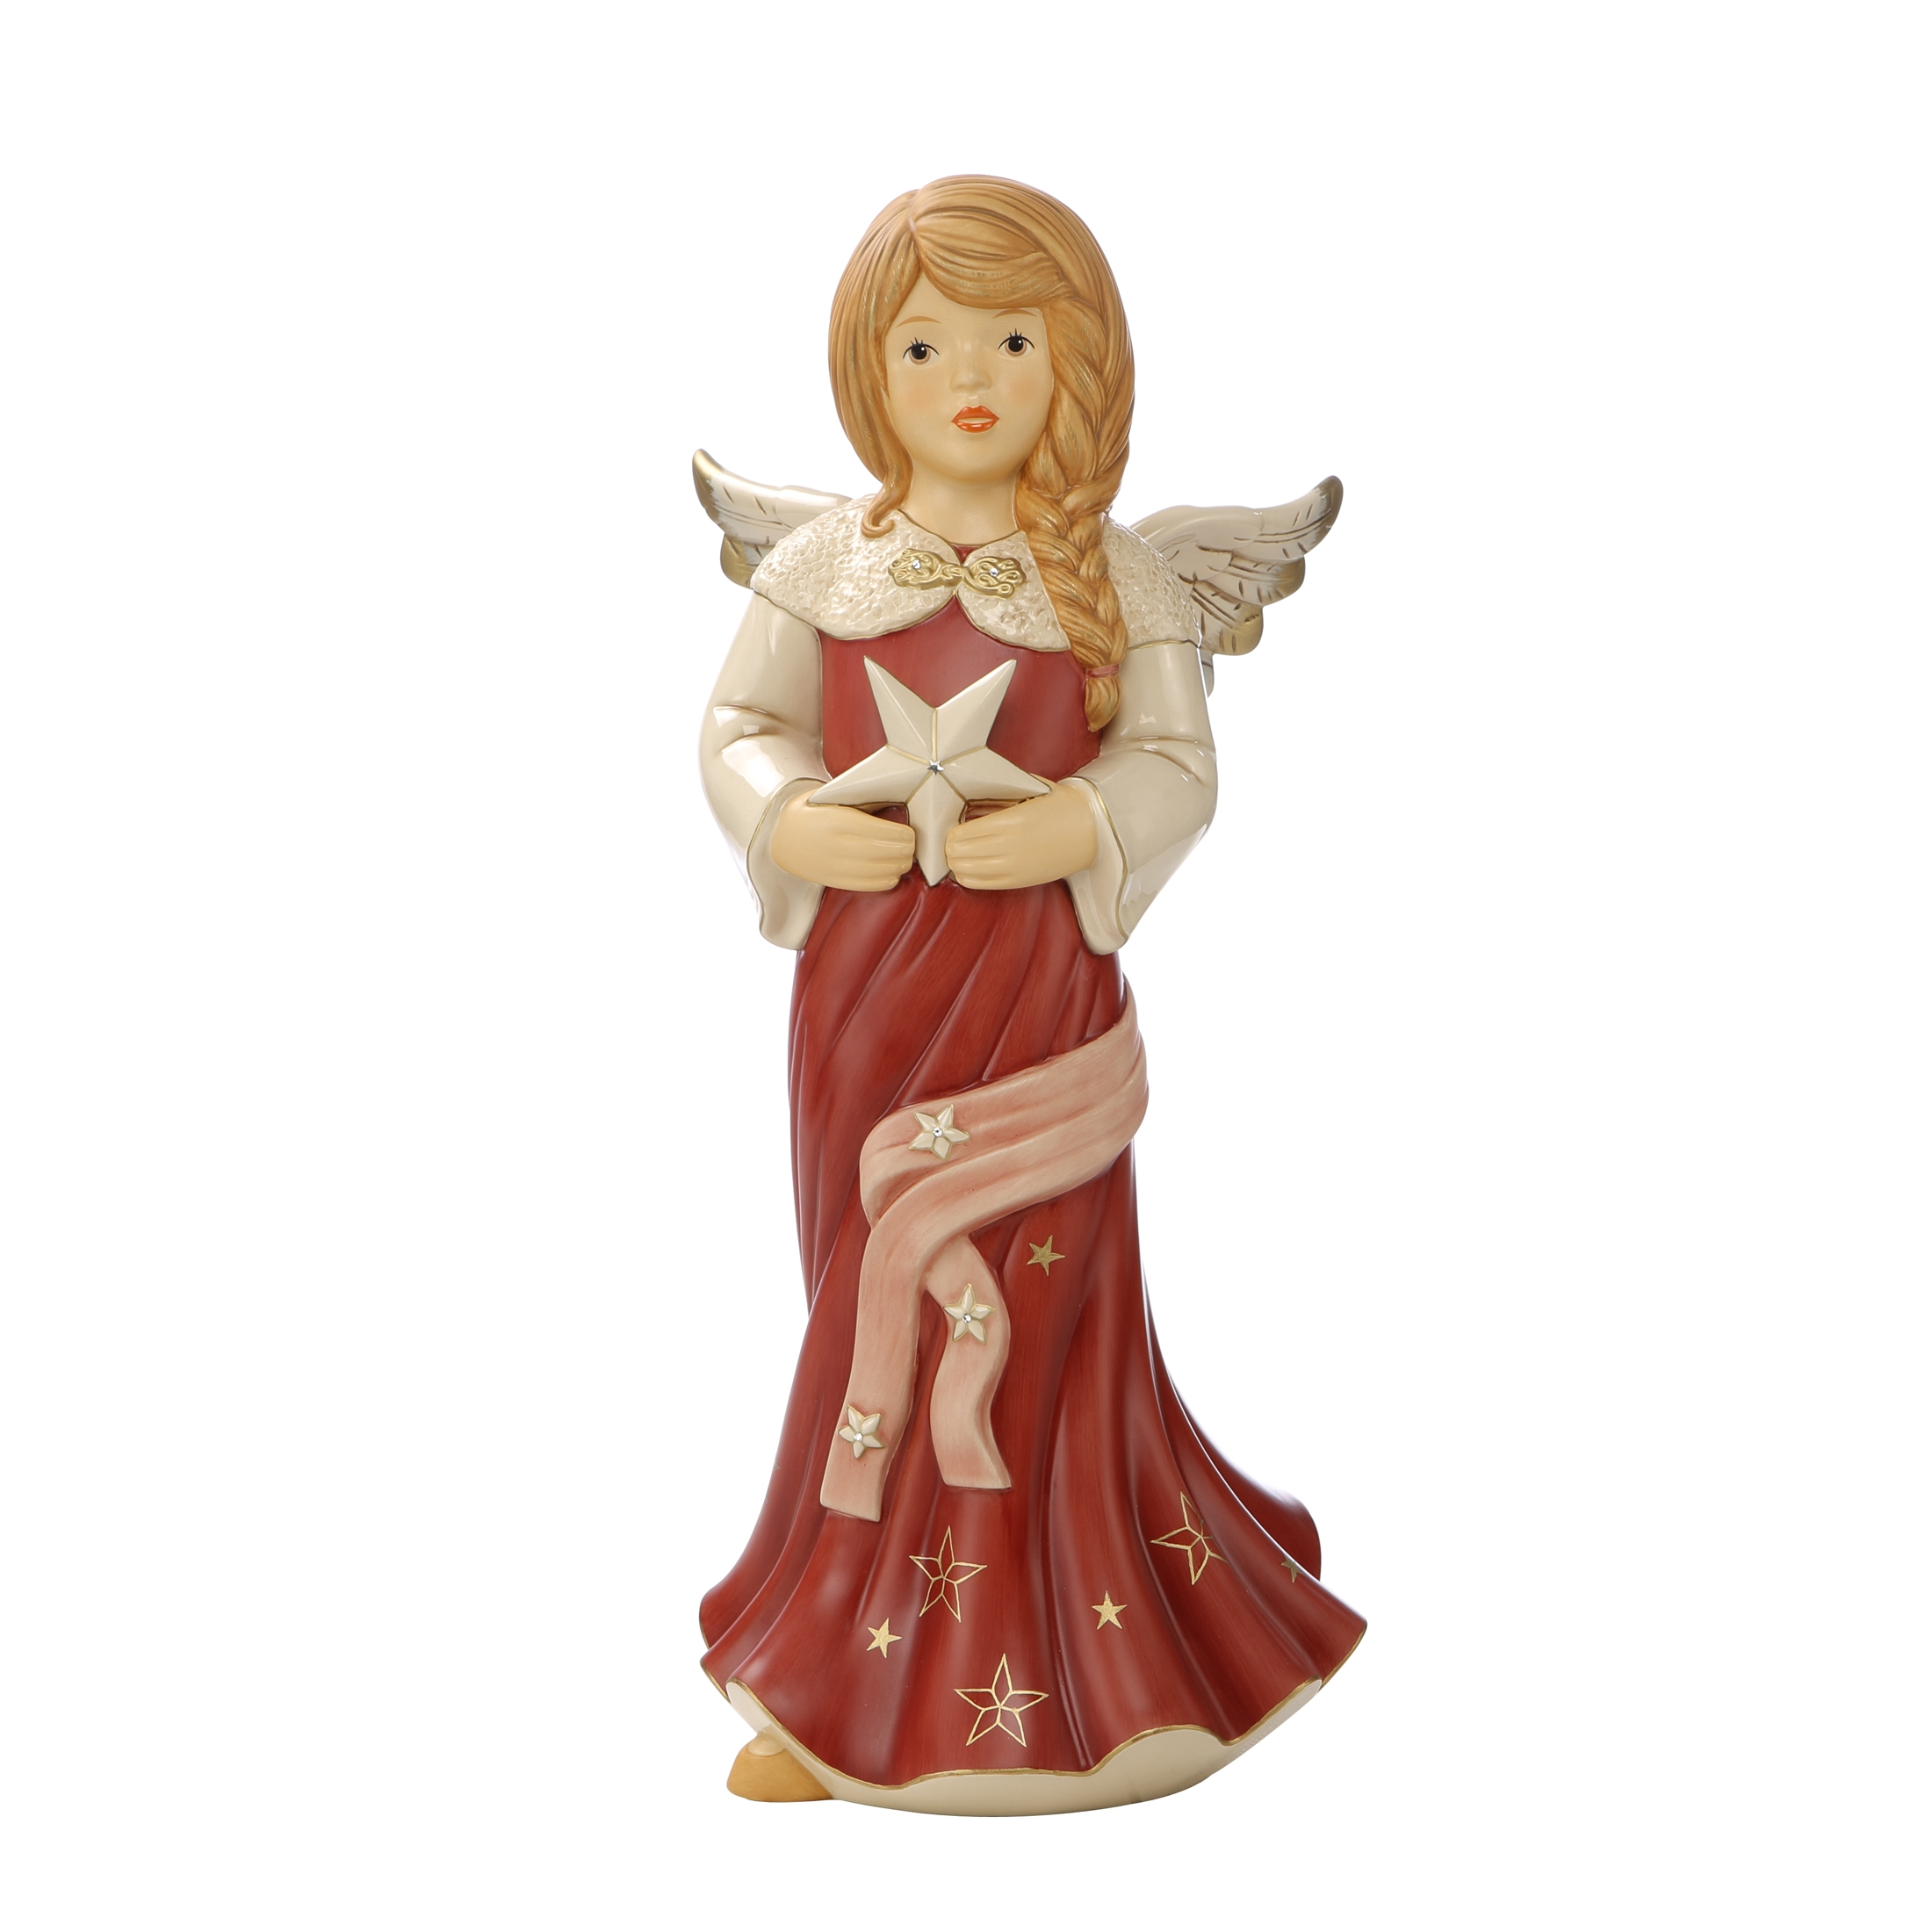 Goebel Weihnachten Himmelsboten 'XM S Funkelnder Sternenregen Ltd Ed bord' 2021 !